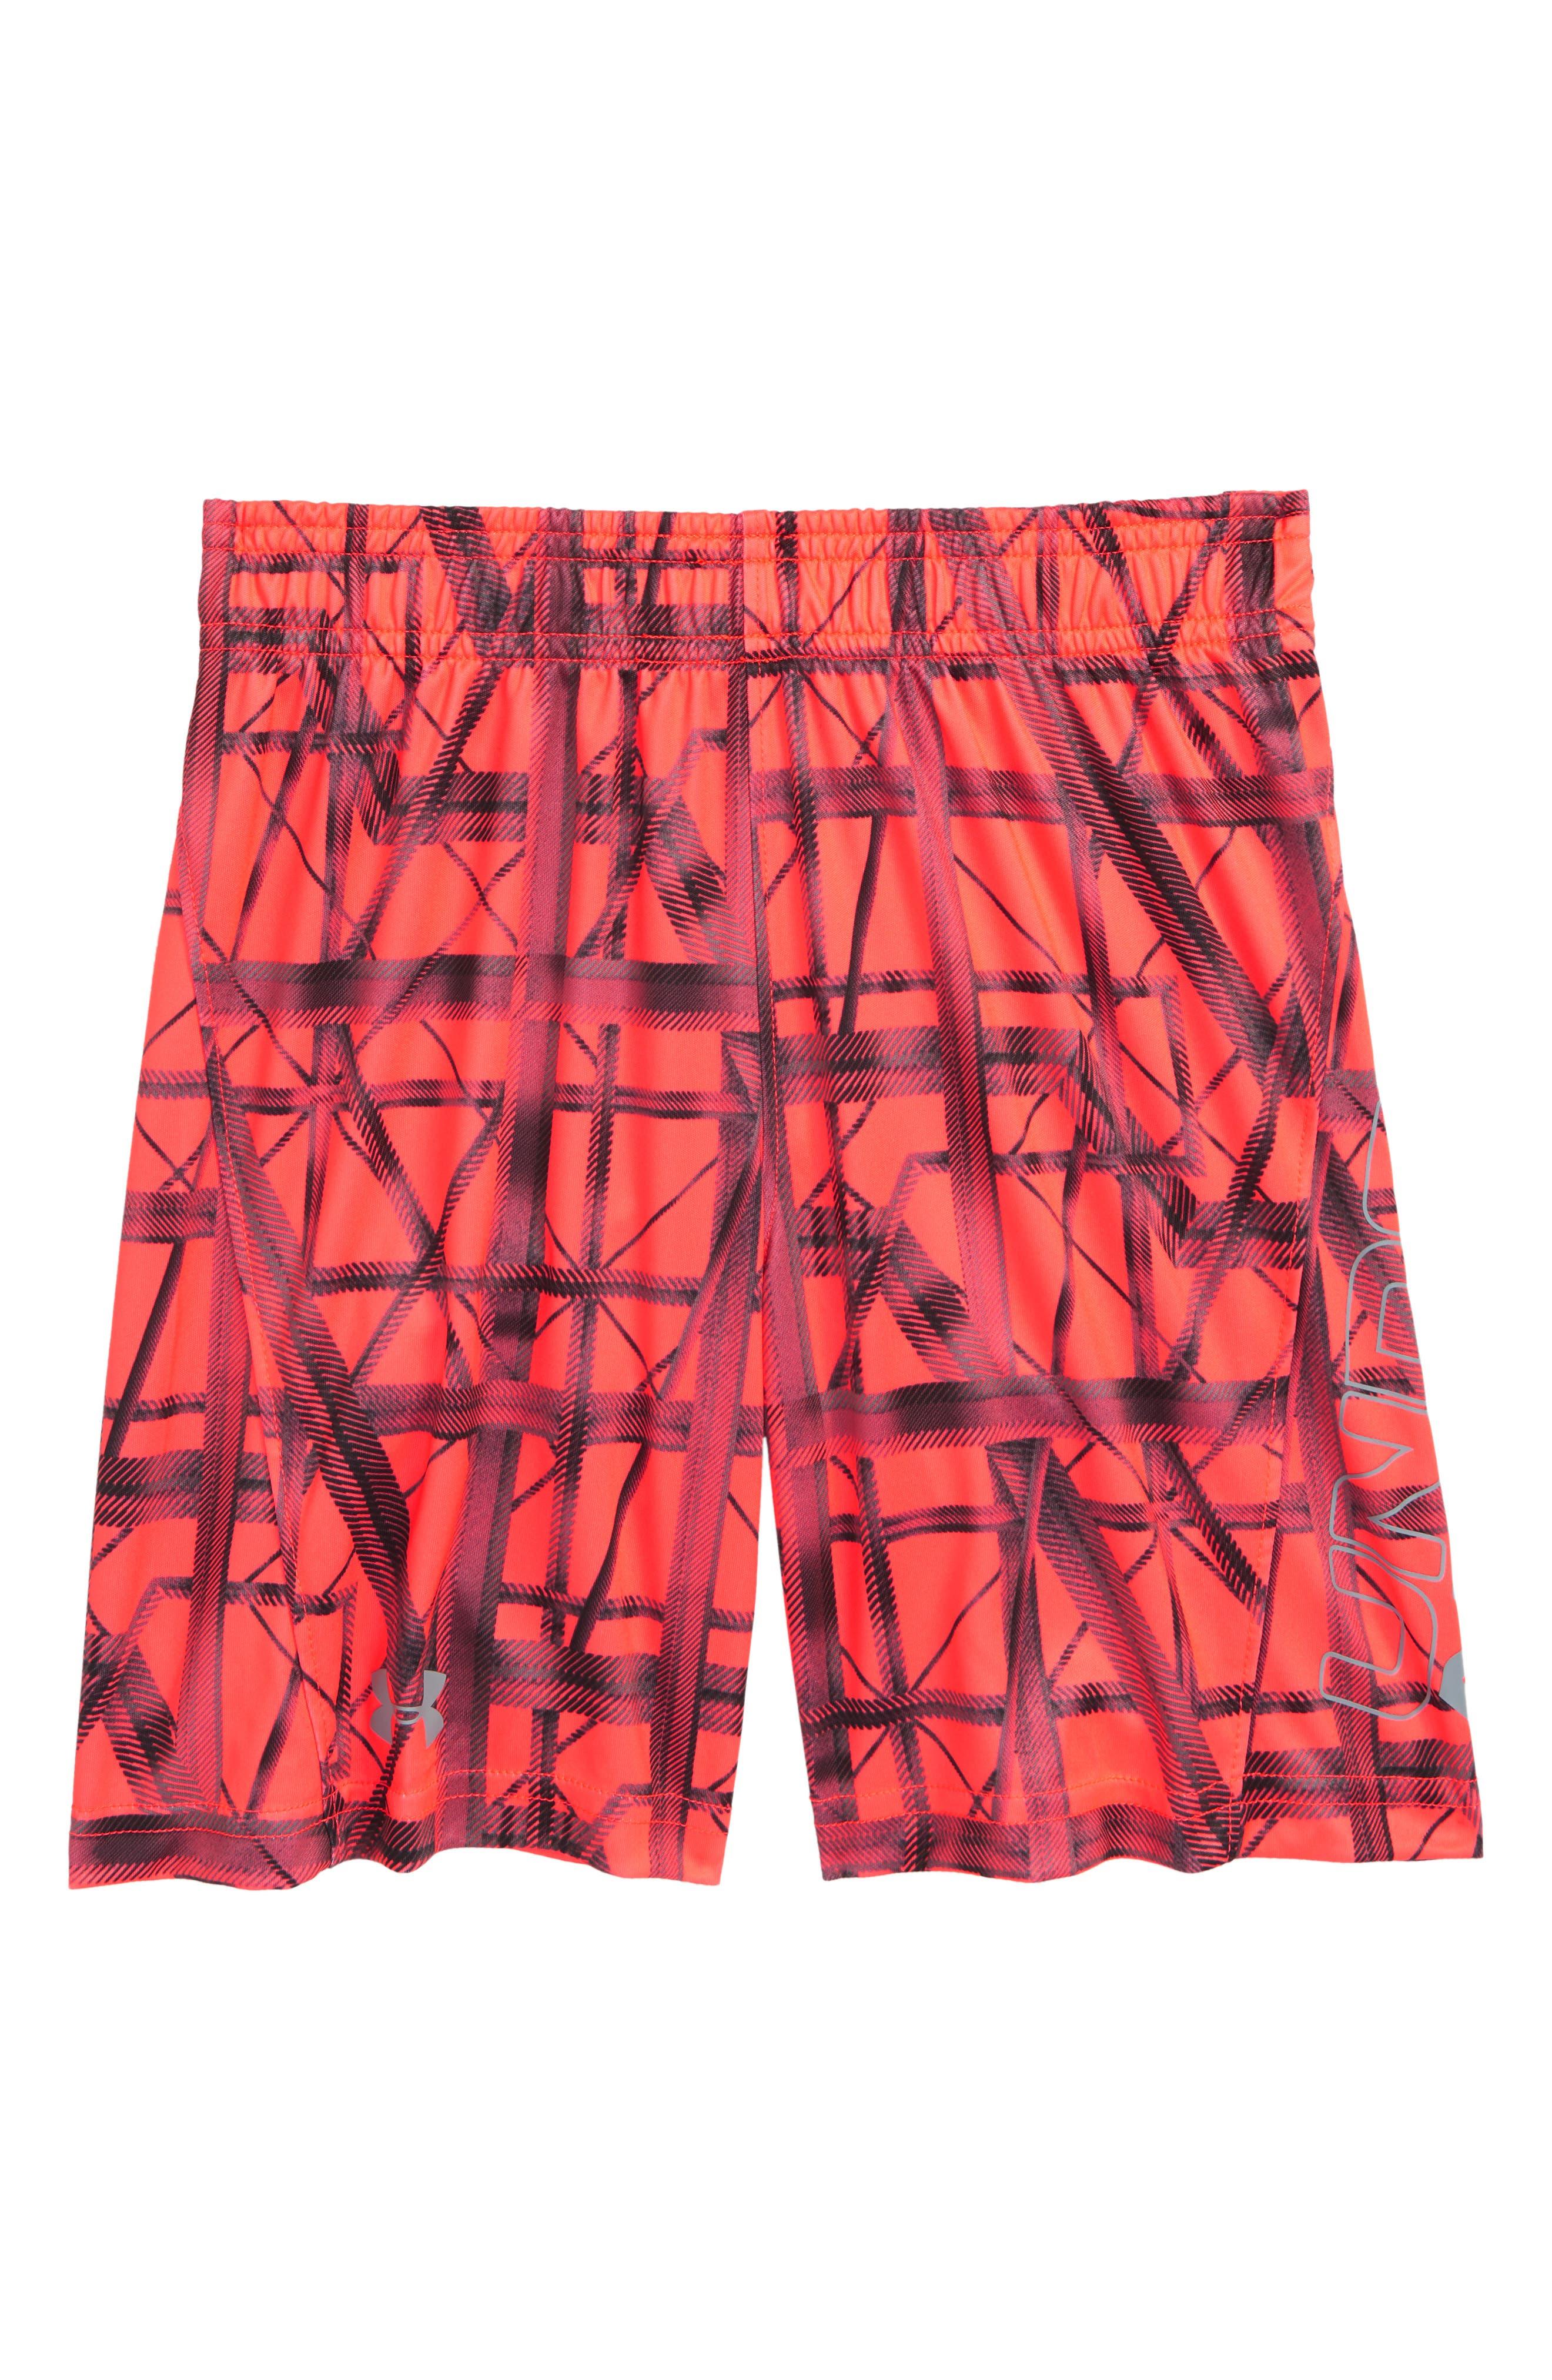 Distinction Boost HeatGear<sup>®</sup> Shorts,                             Main thumbnail 1, color,                             820